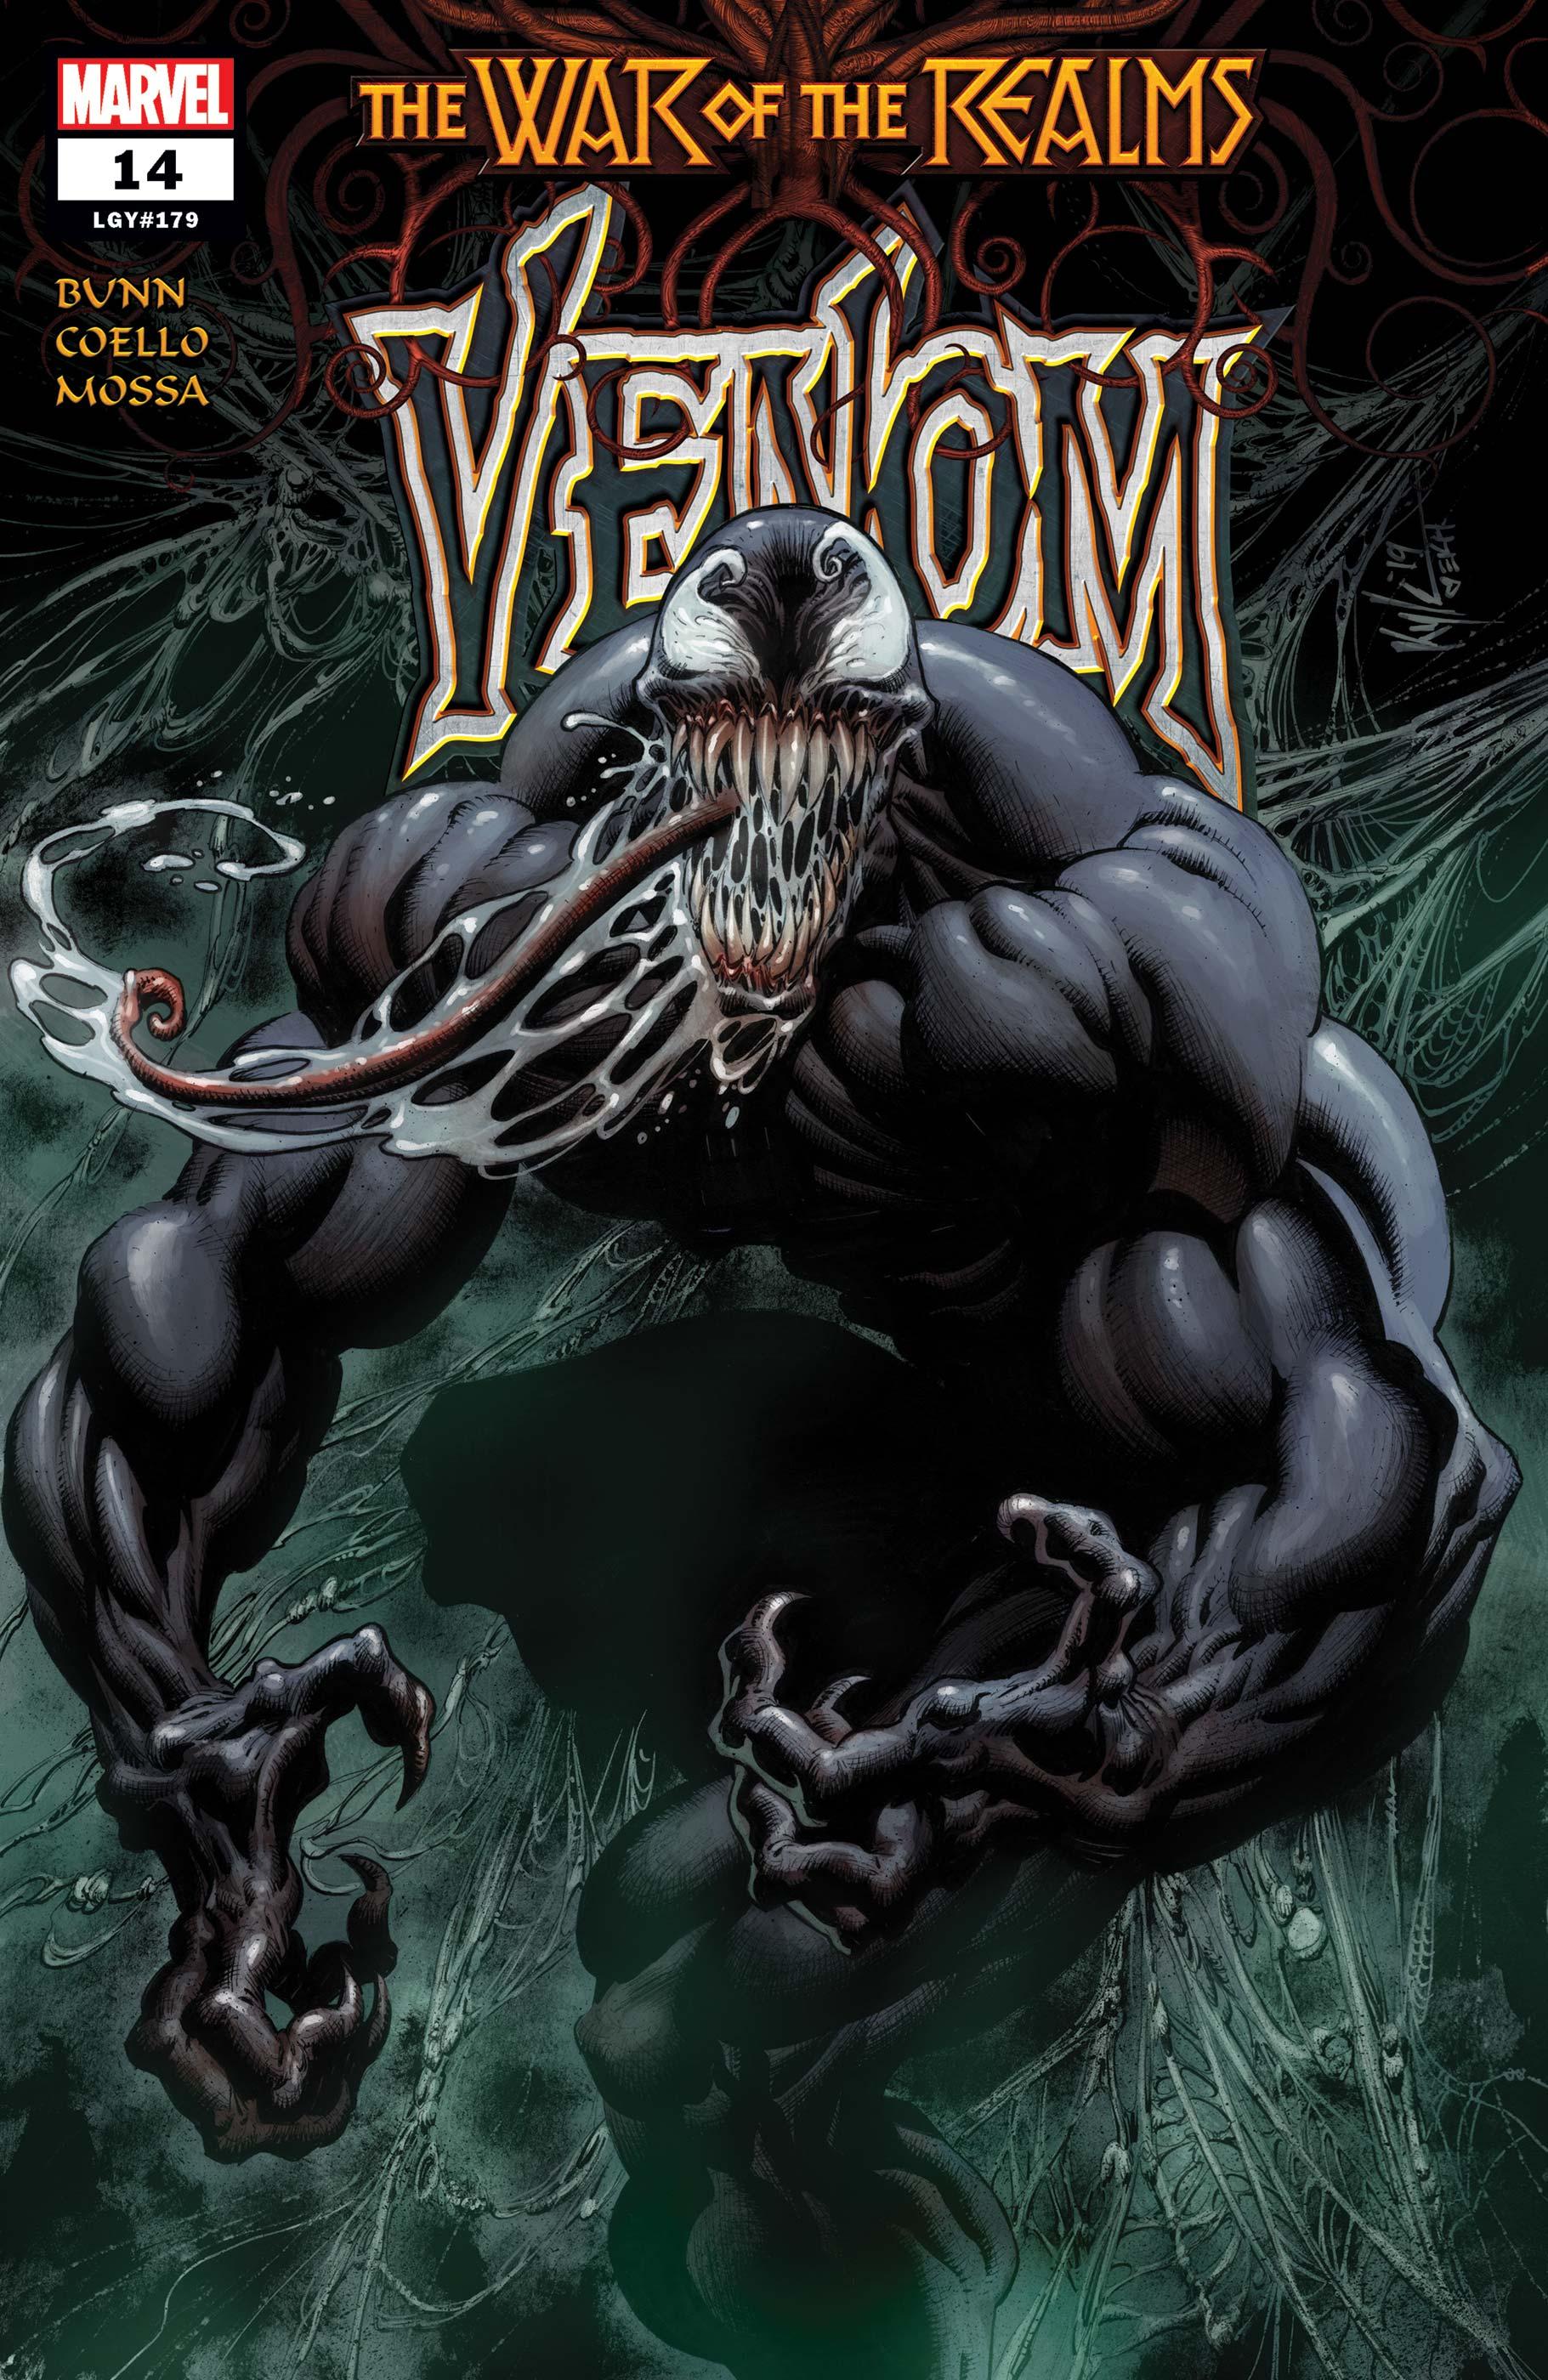 Venom (2018) #14